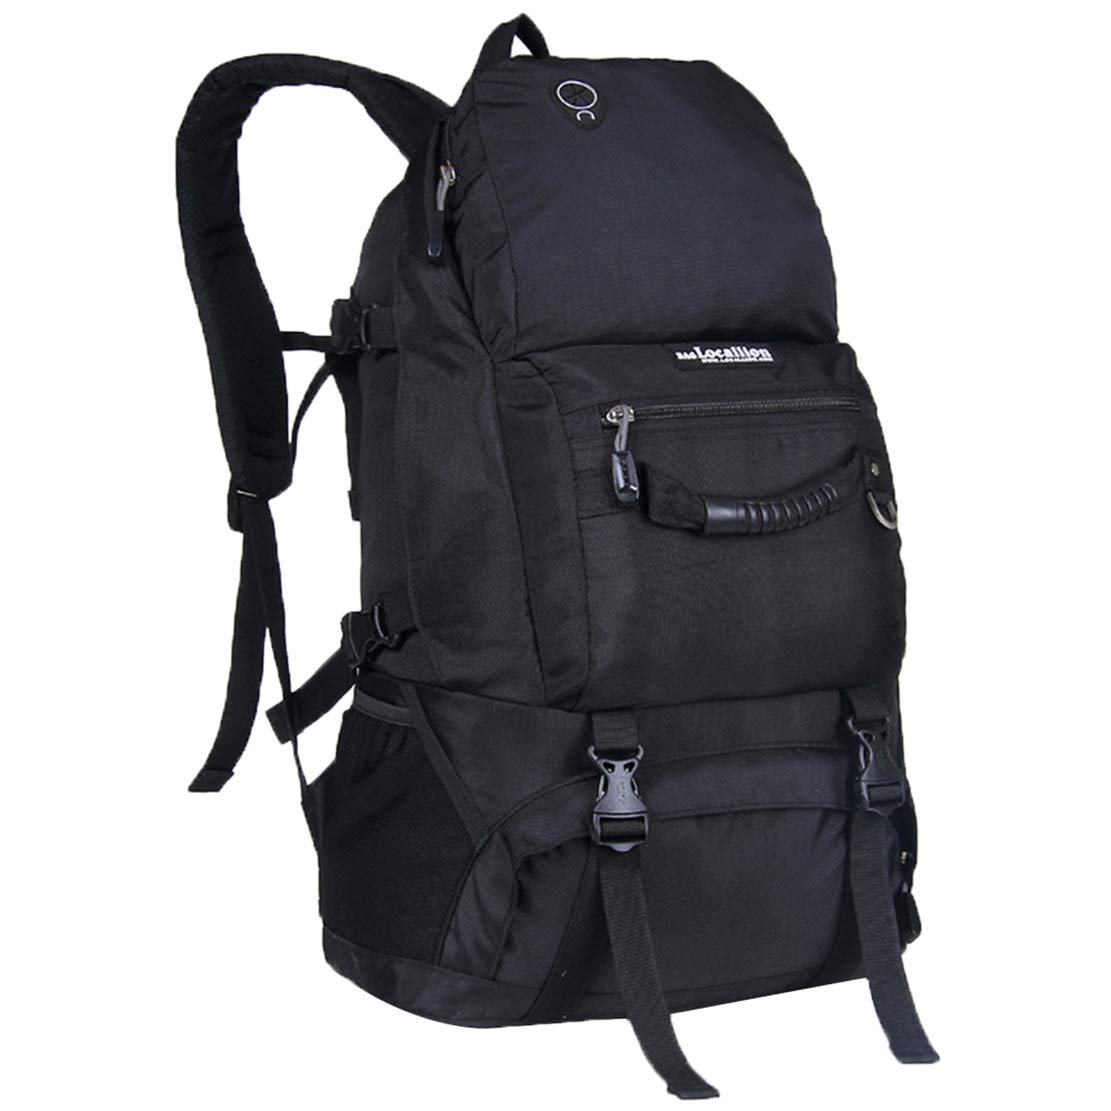 DaQao Herren Nylon Rucksack Outdoor Outdoor Outdoor Tactical Daypacks Sport Reise Groß Backpack Waterproof Casual Freizeitrucksack B07L7LP79Q Daypacks Verkaufspreis 765498